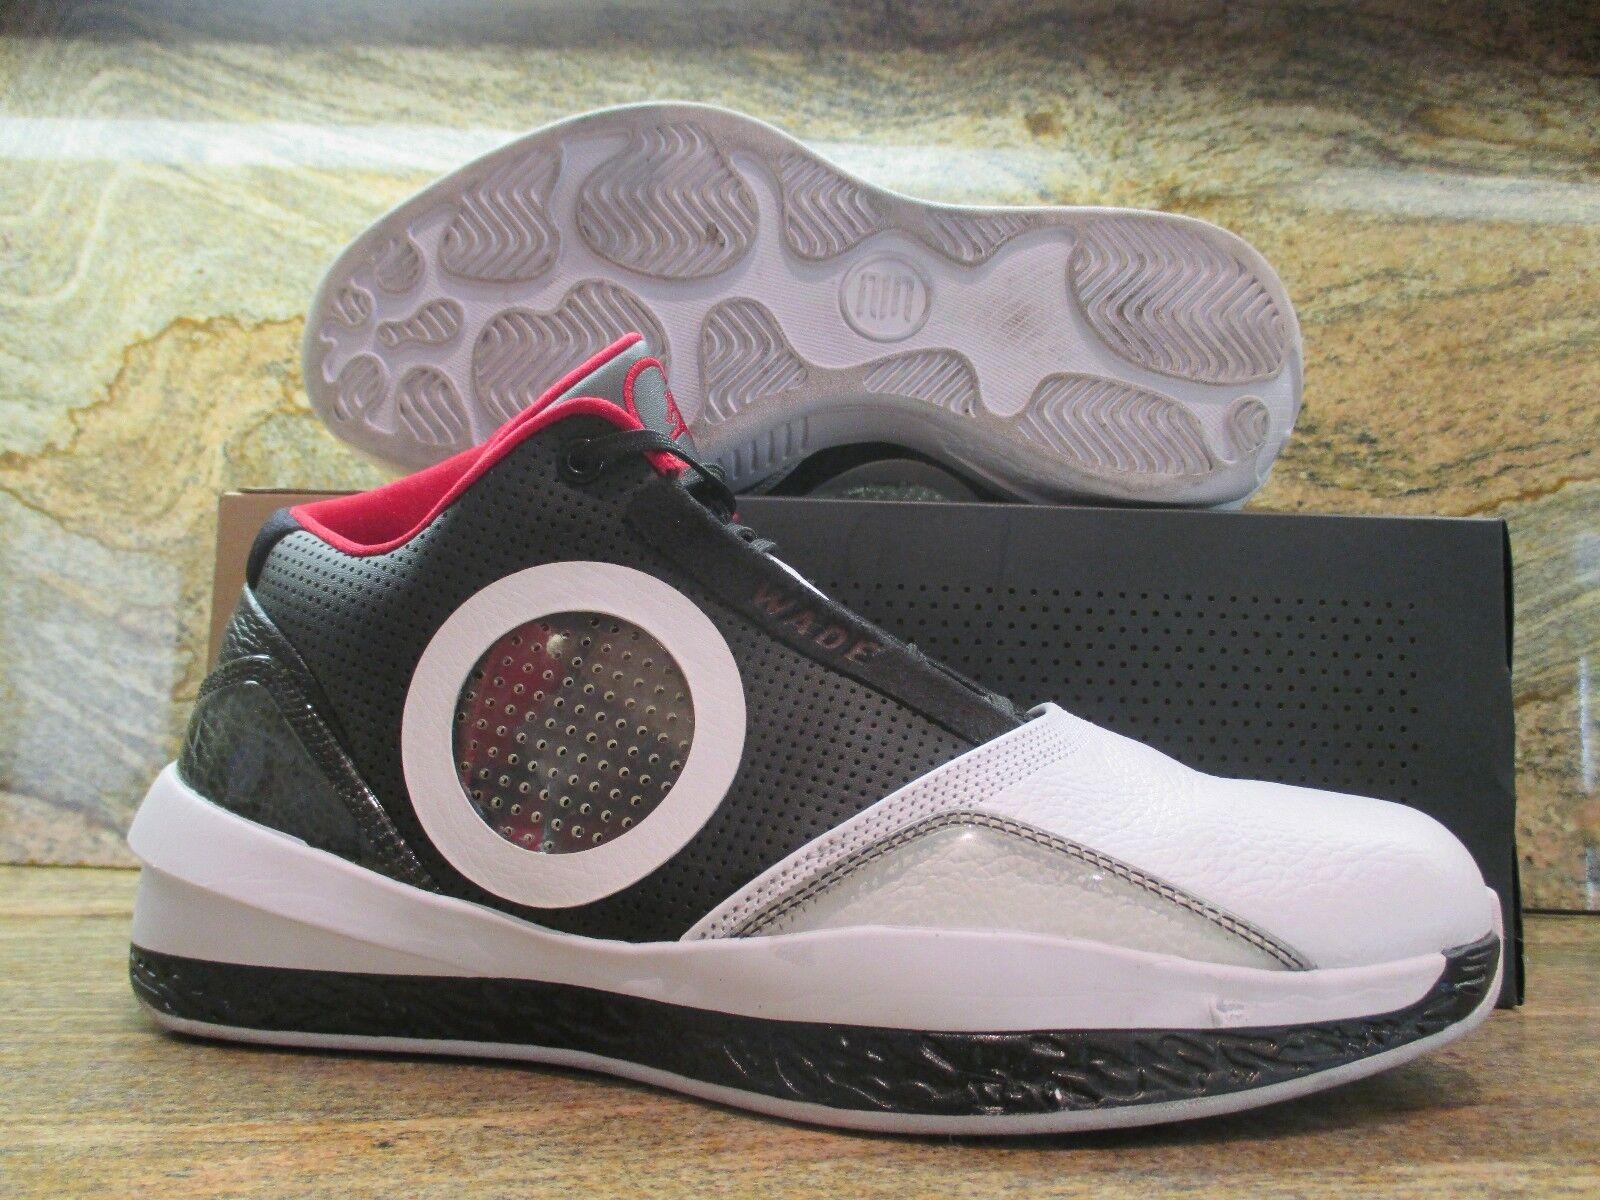 38b8572905 Nike Air Jordan 2010 Dwayne Wade Pe Sz 9.5 Miami Heat Promo Probe Og 387358-